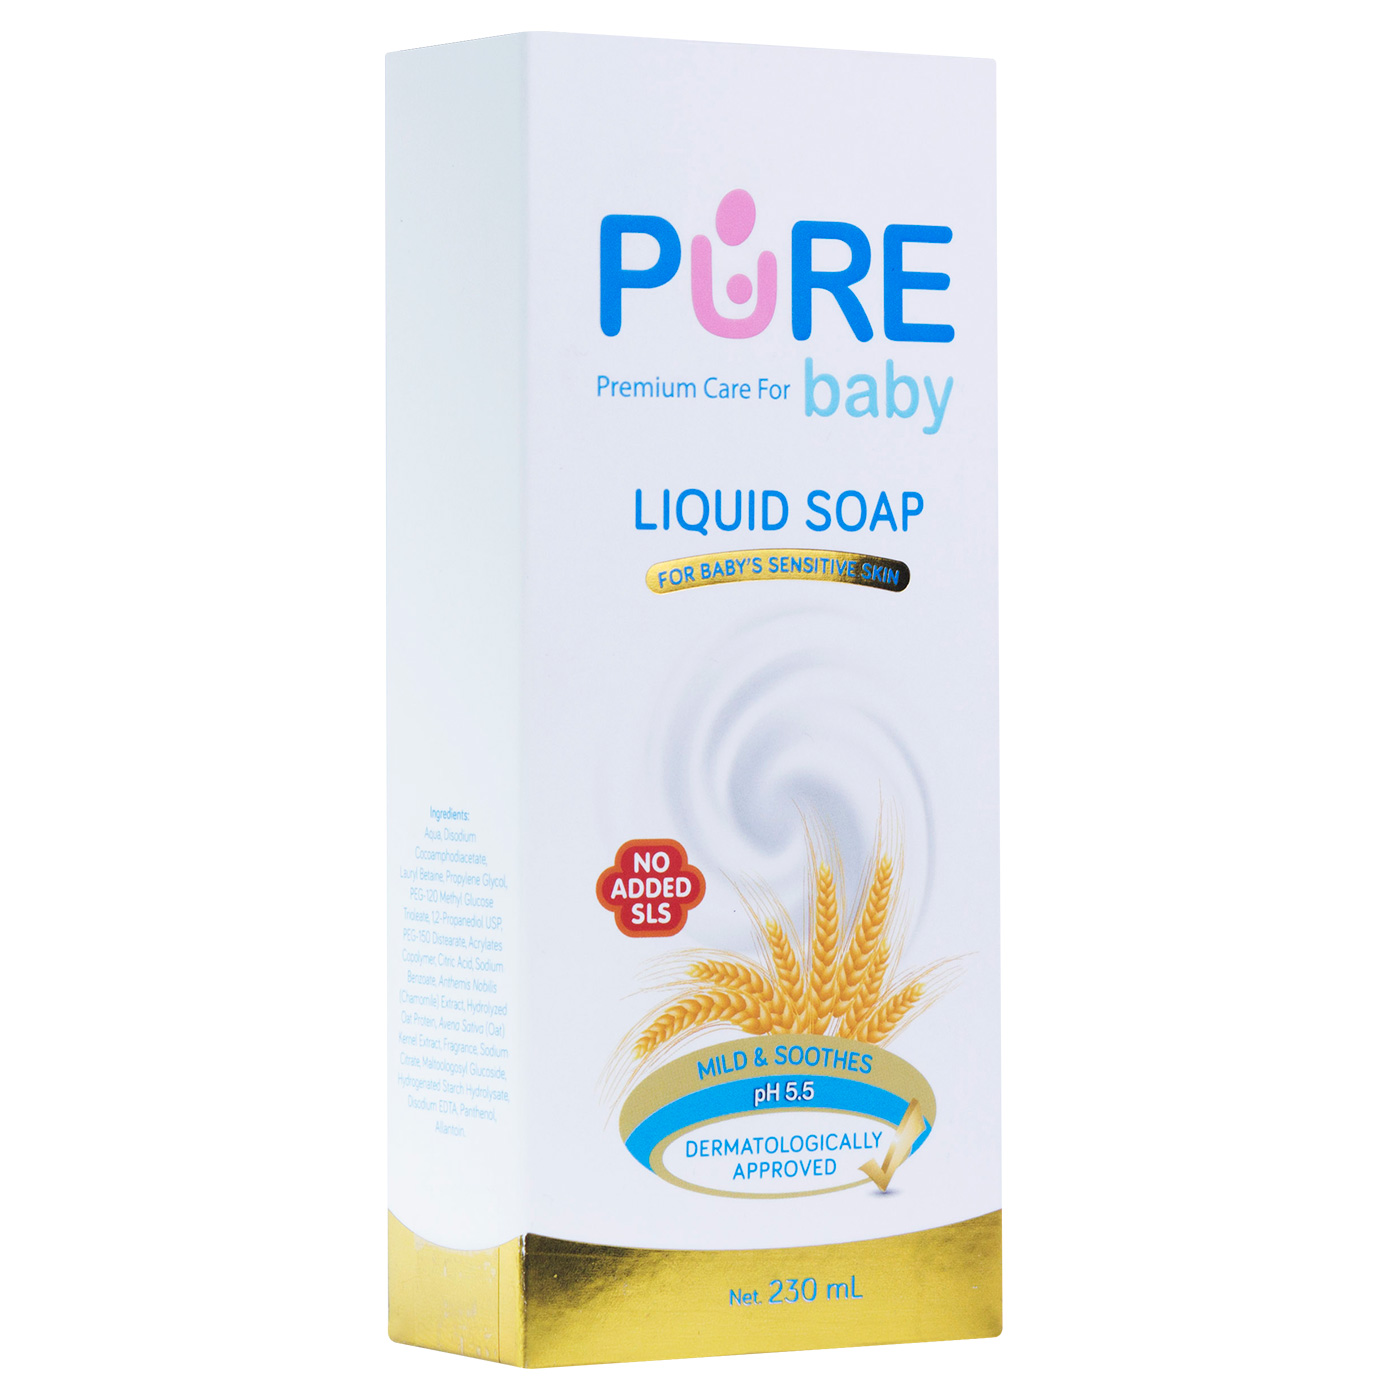 Pure baby Liquid Soap